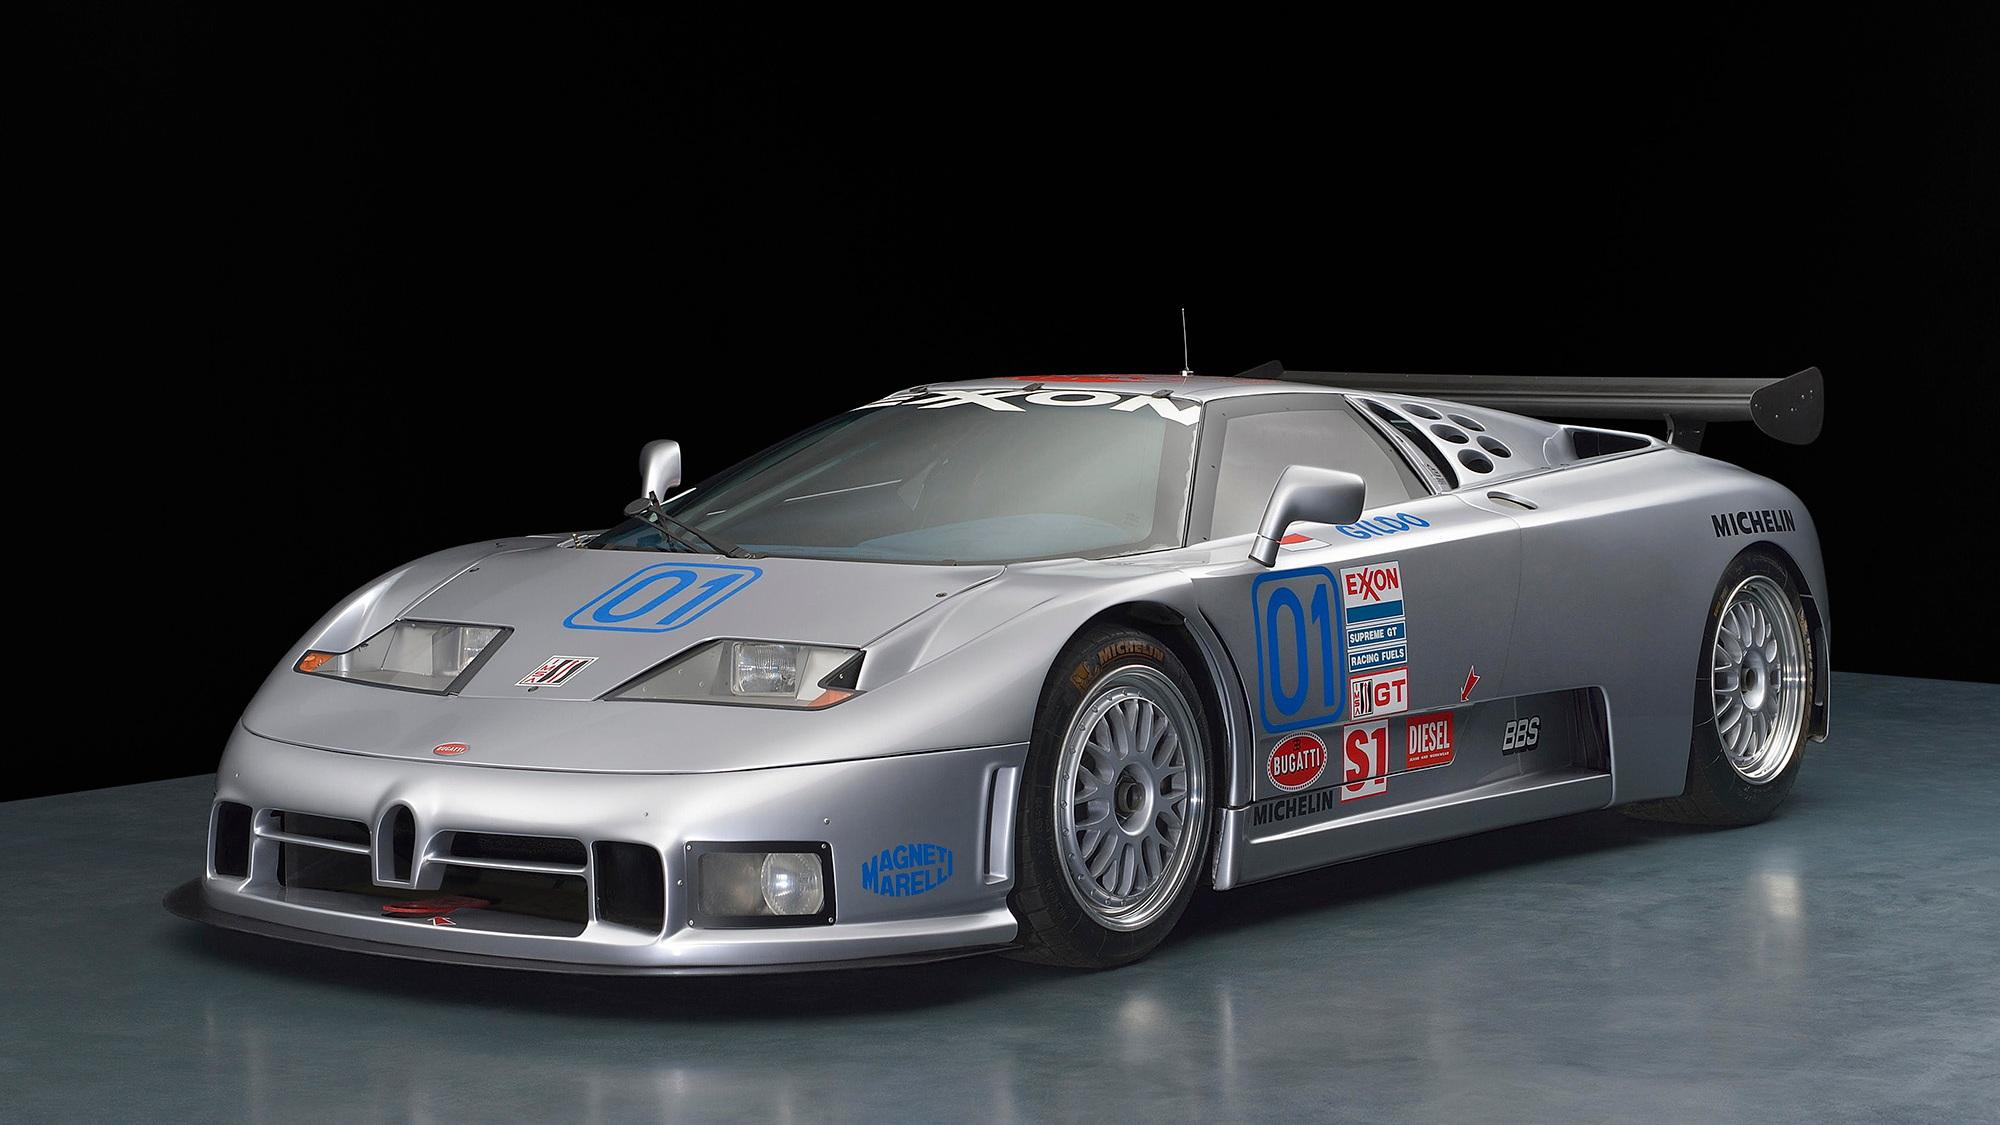 Bugatti EB110 SC GTS-1